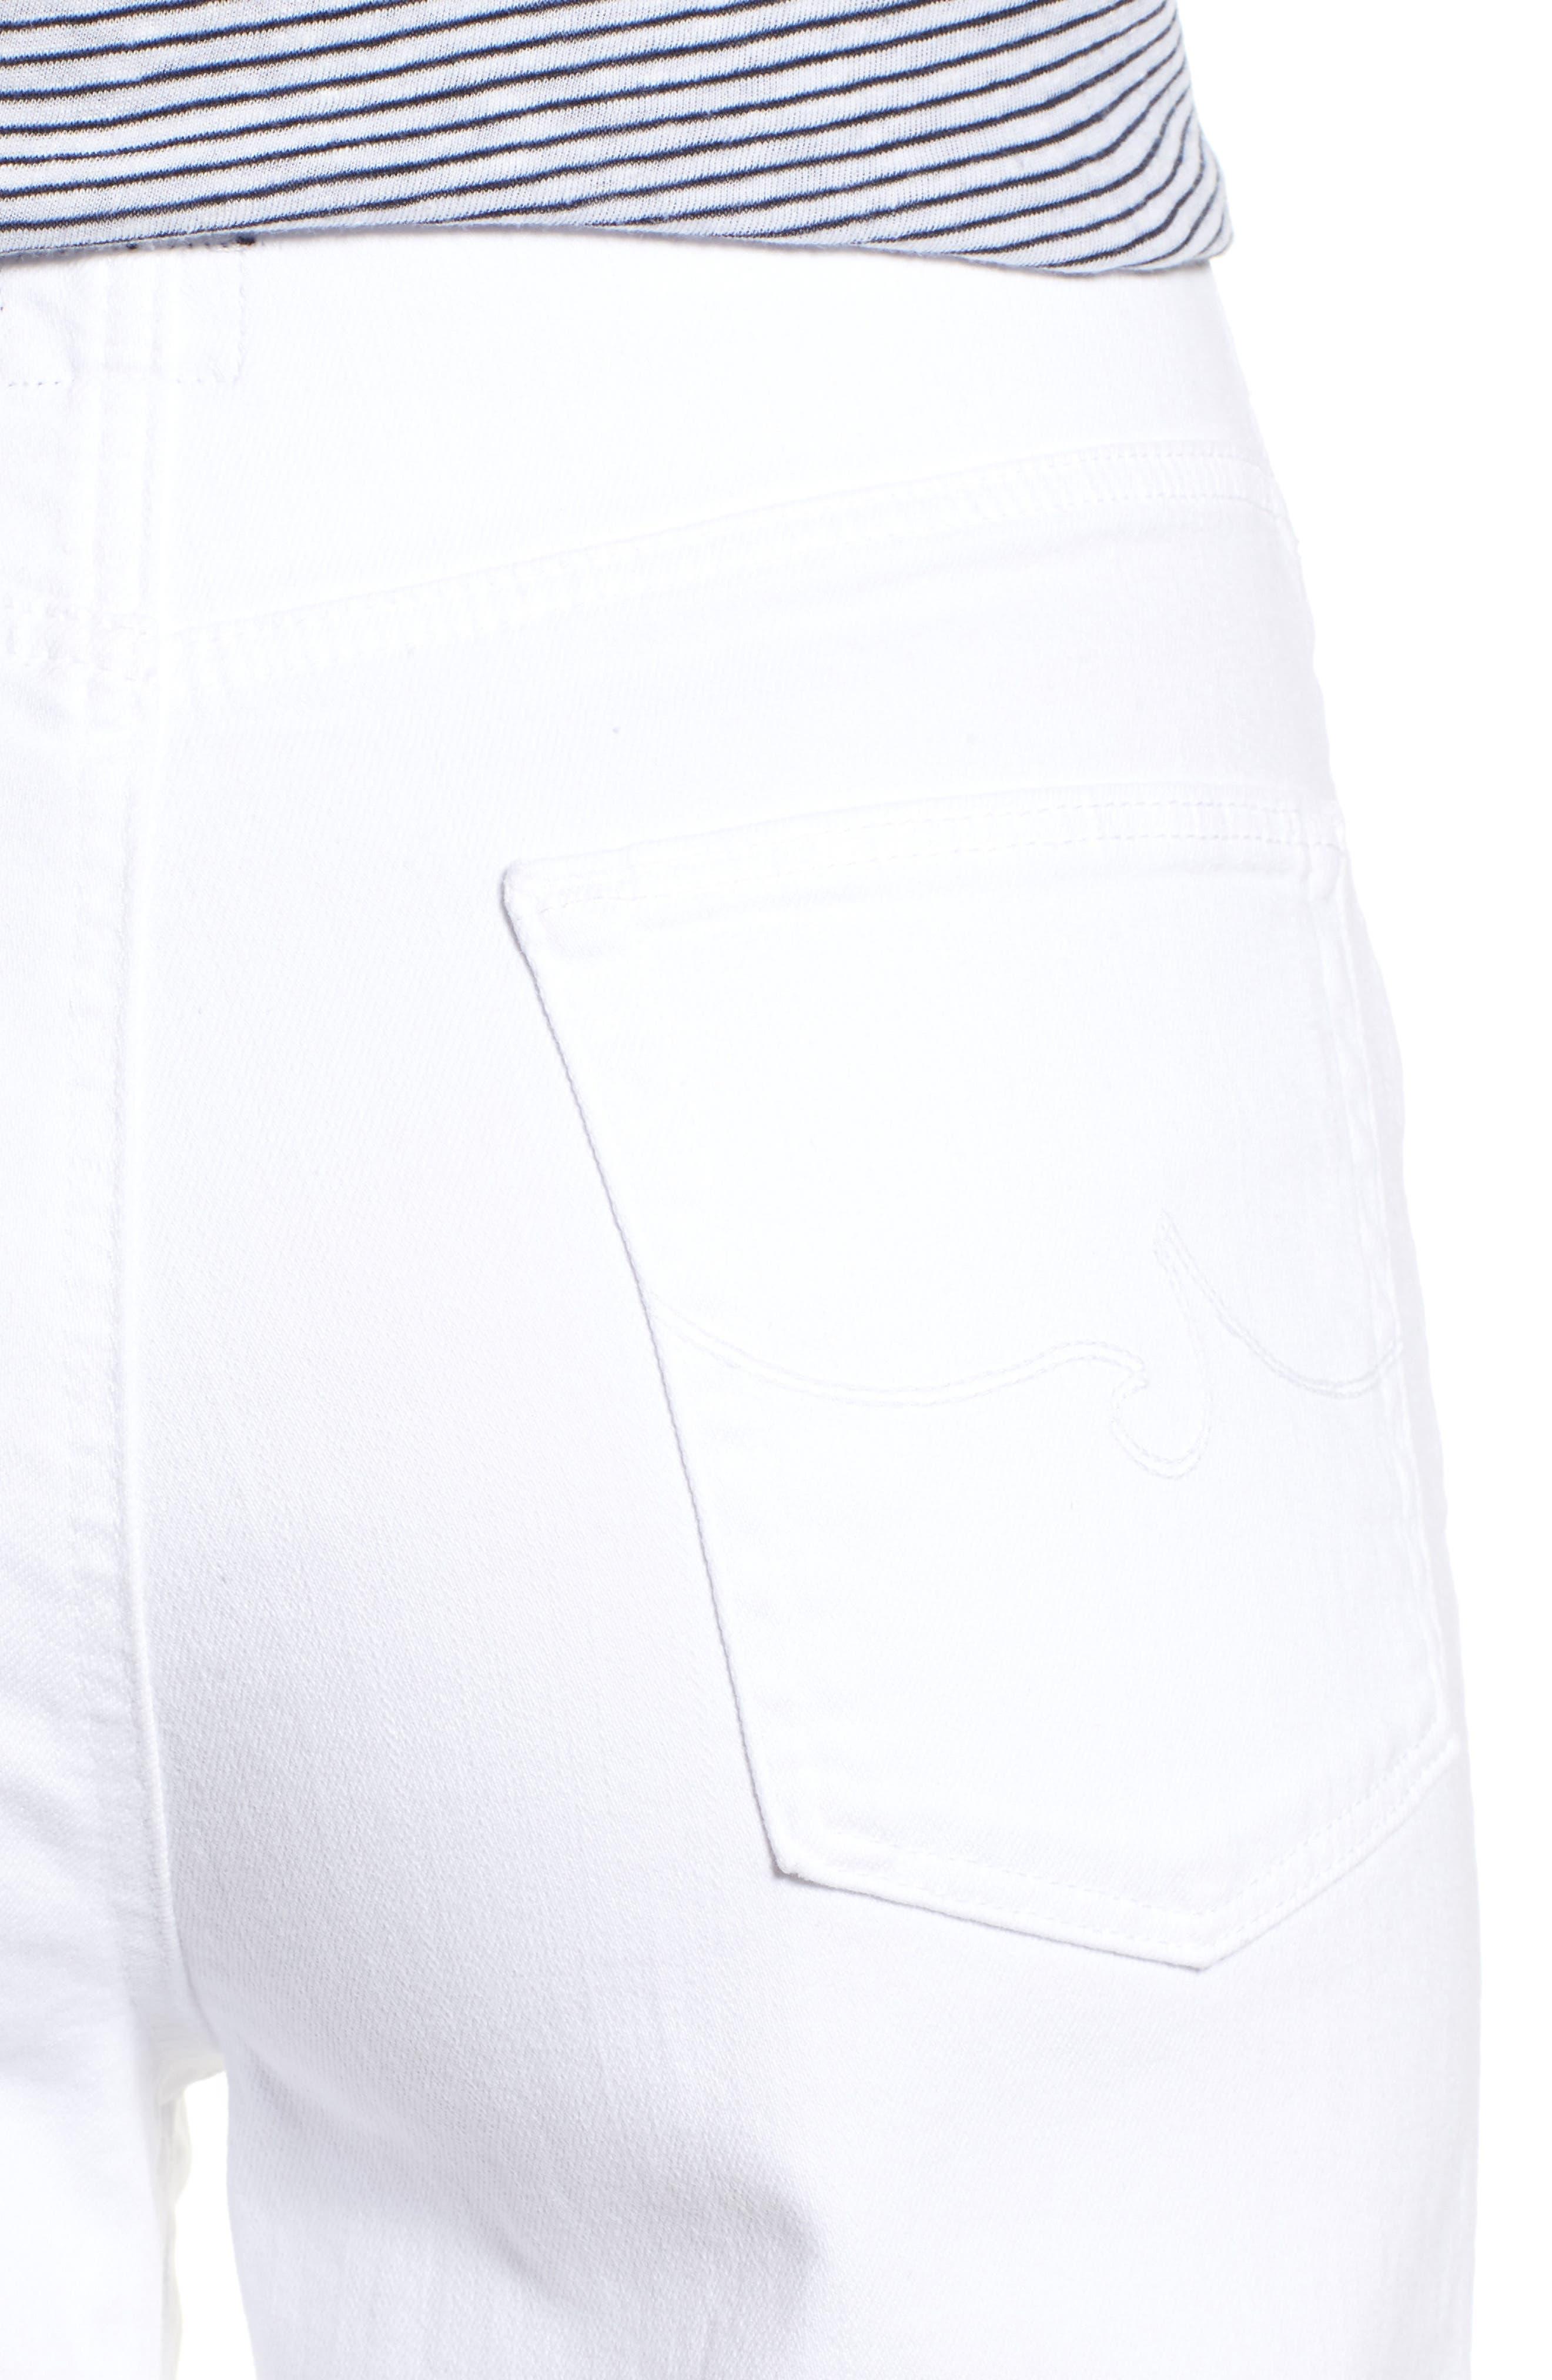 Etta High Waist Crop Wide Leg Jeans,                             Alternate thumbnail 4, color,                             White